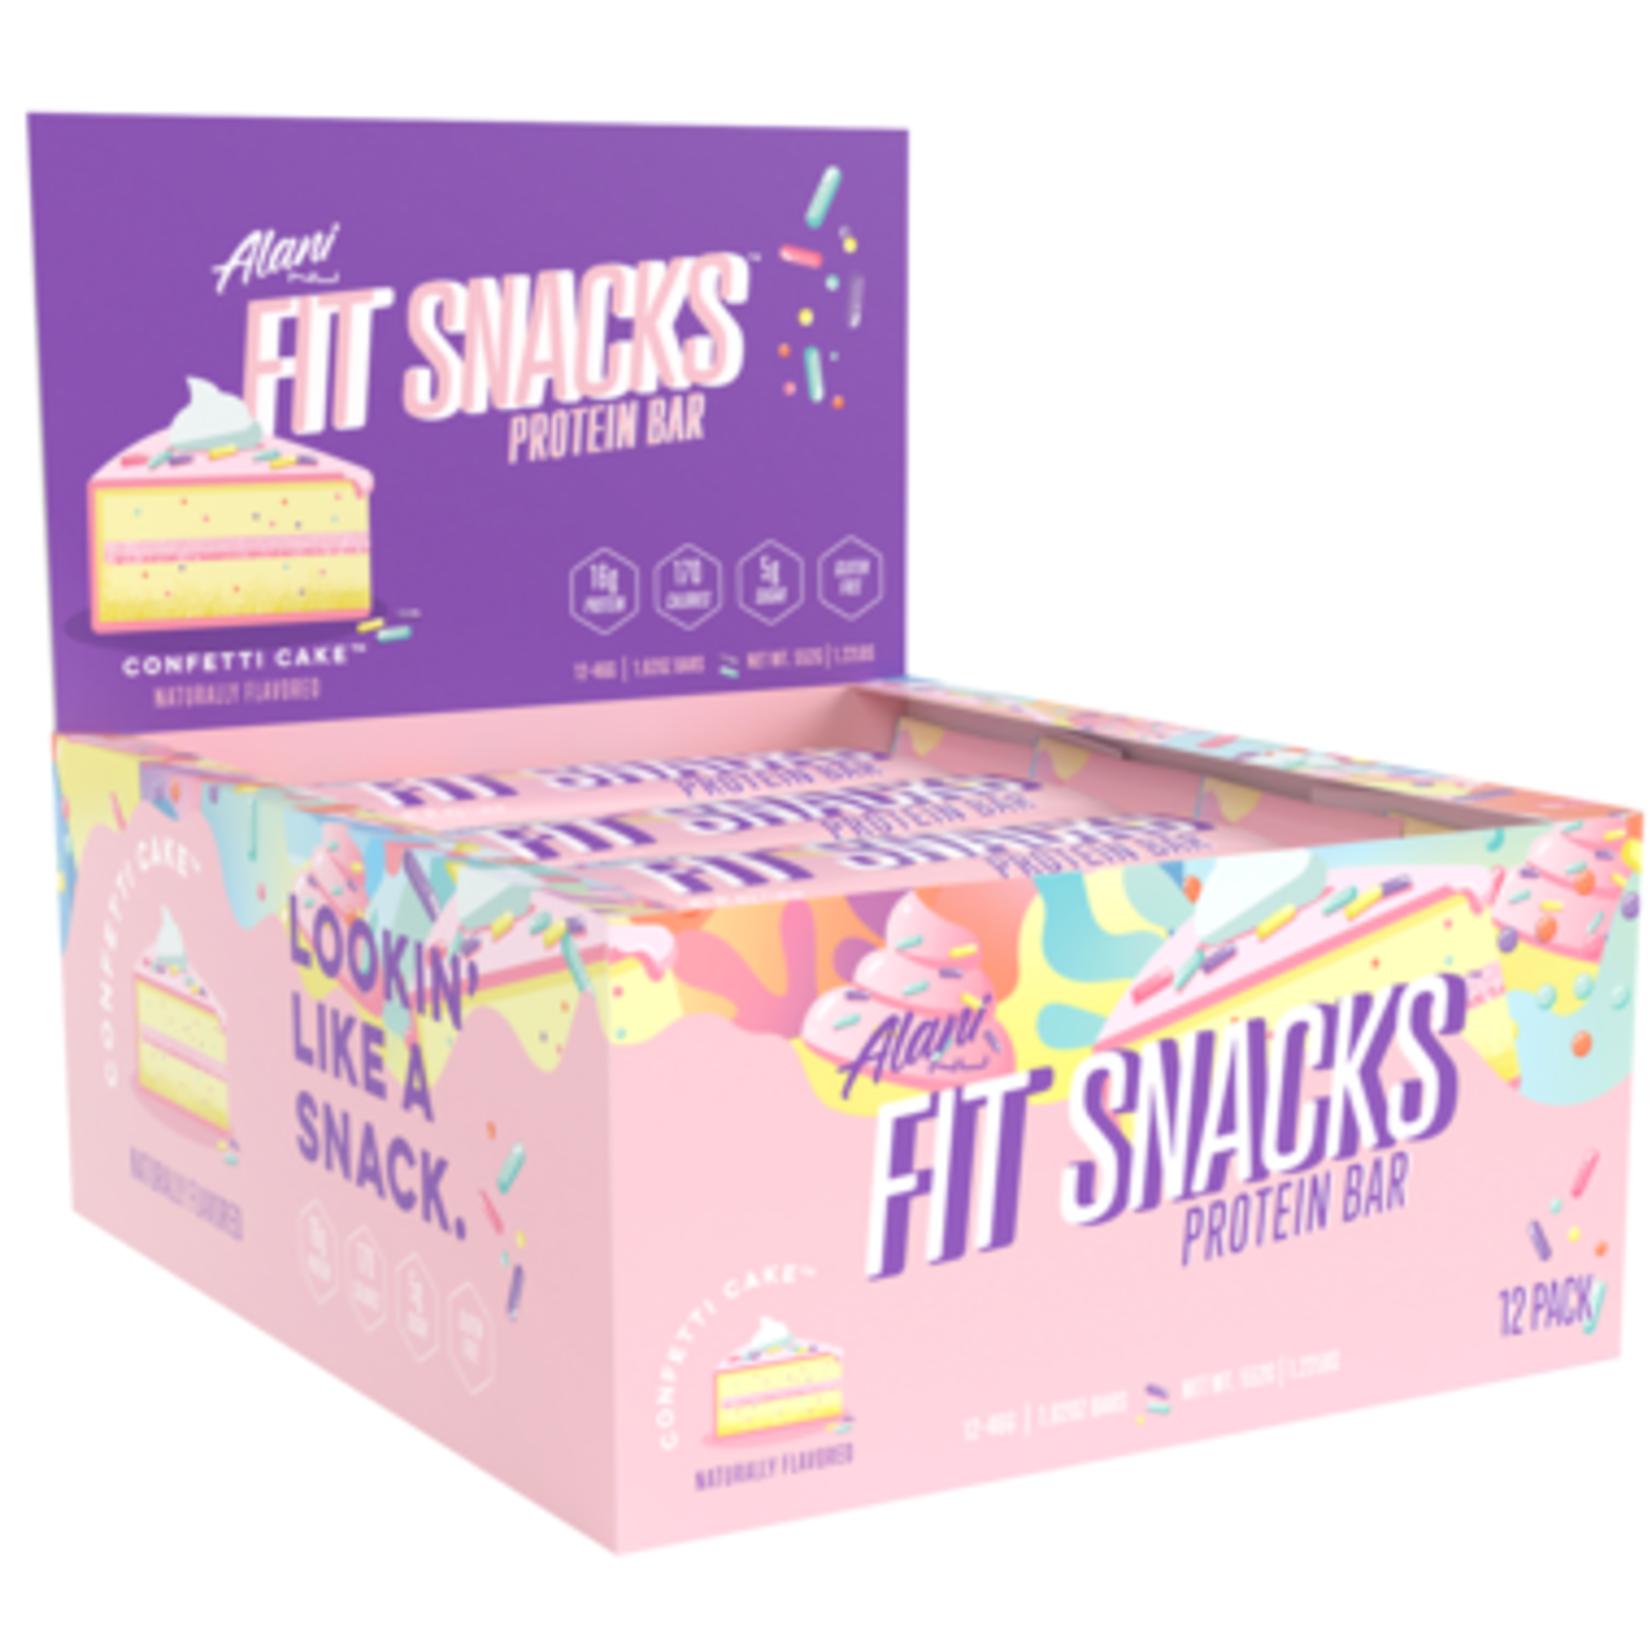 Alani Nu Fit Snacks Protein Bar - Confetti Cake